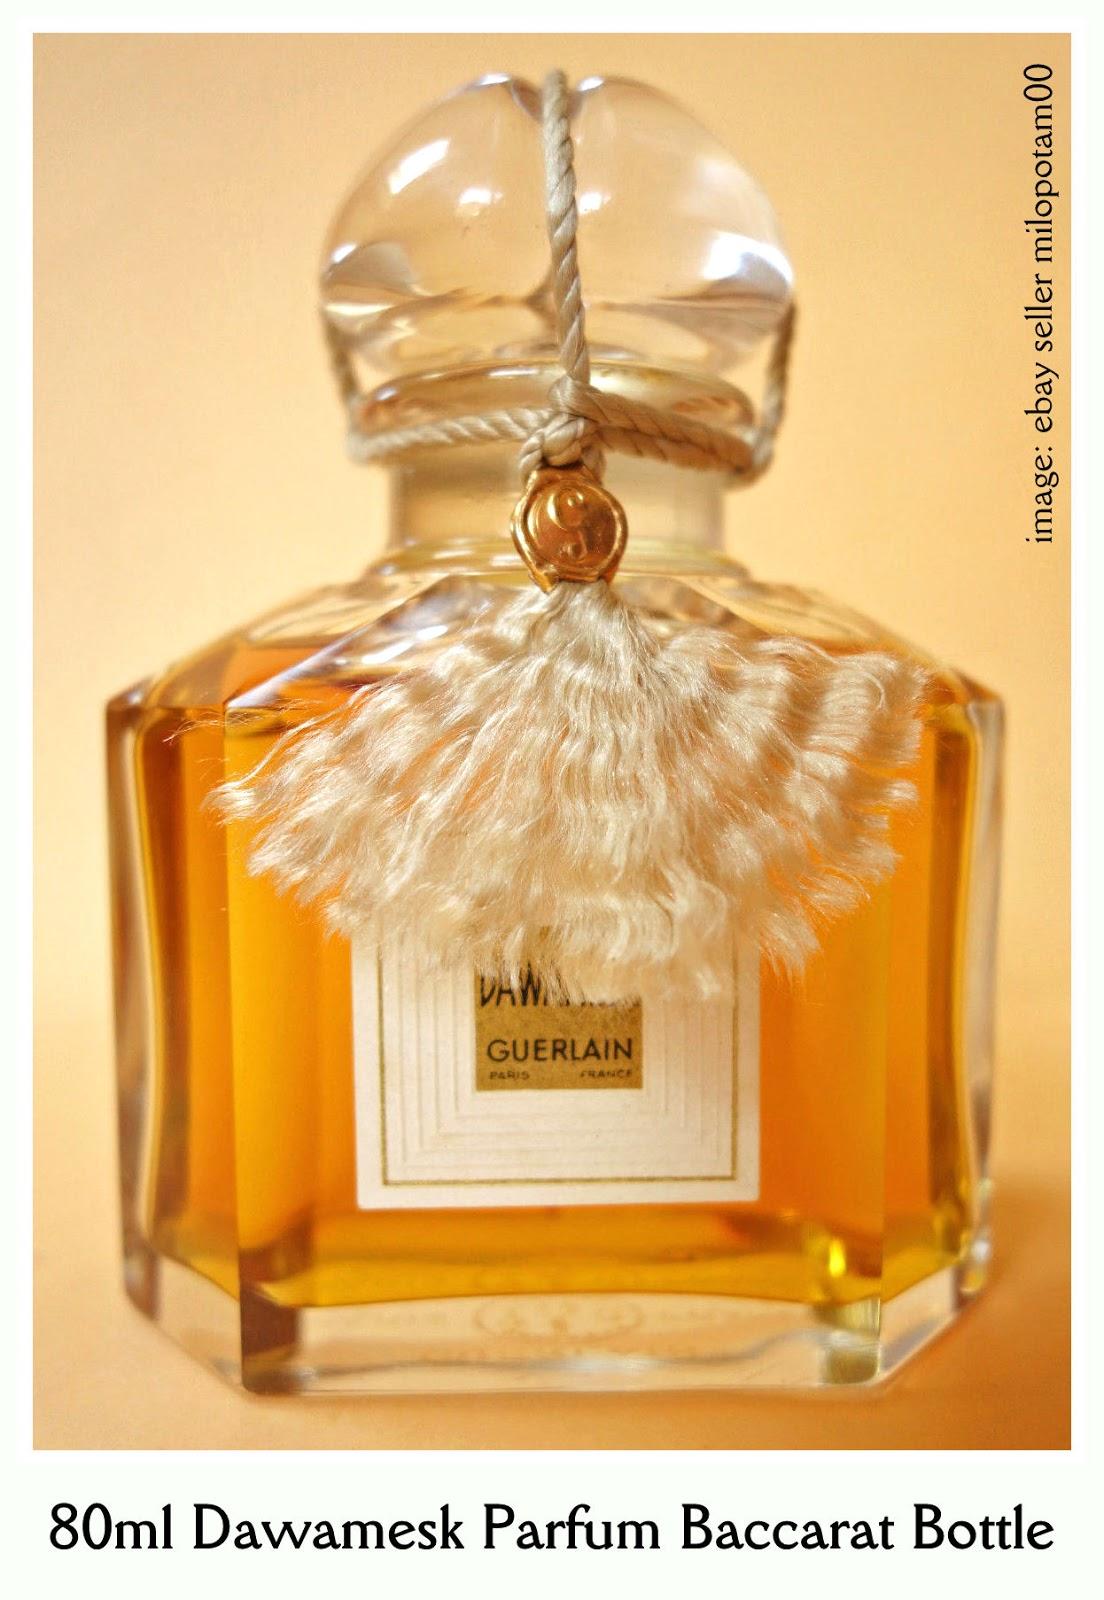 Guerlain Guerlain Perfumes2016 Guerlain Perfumes2016 Perfumes2016 Guerlain Perfumes2016 oerCxdB